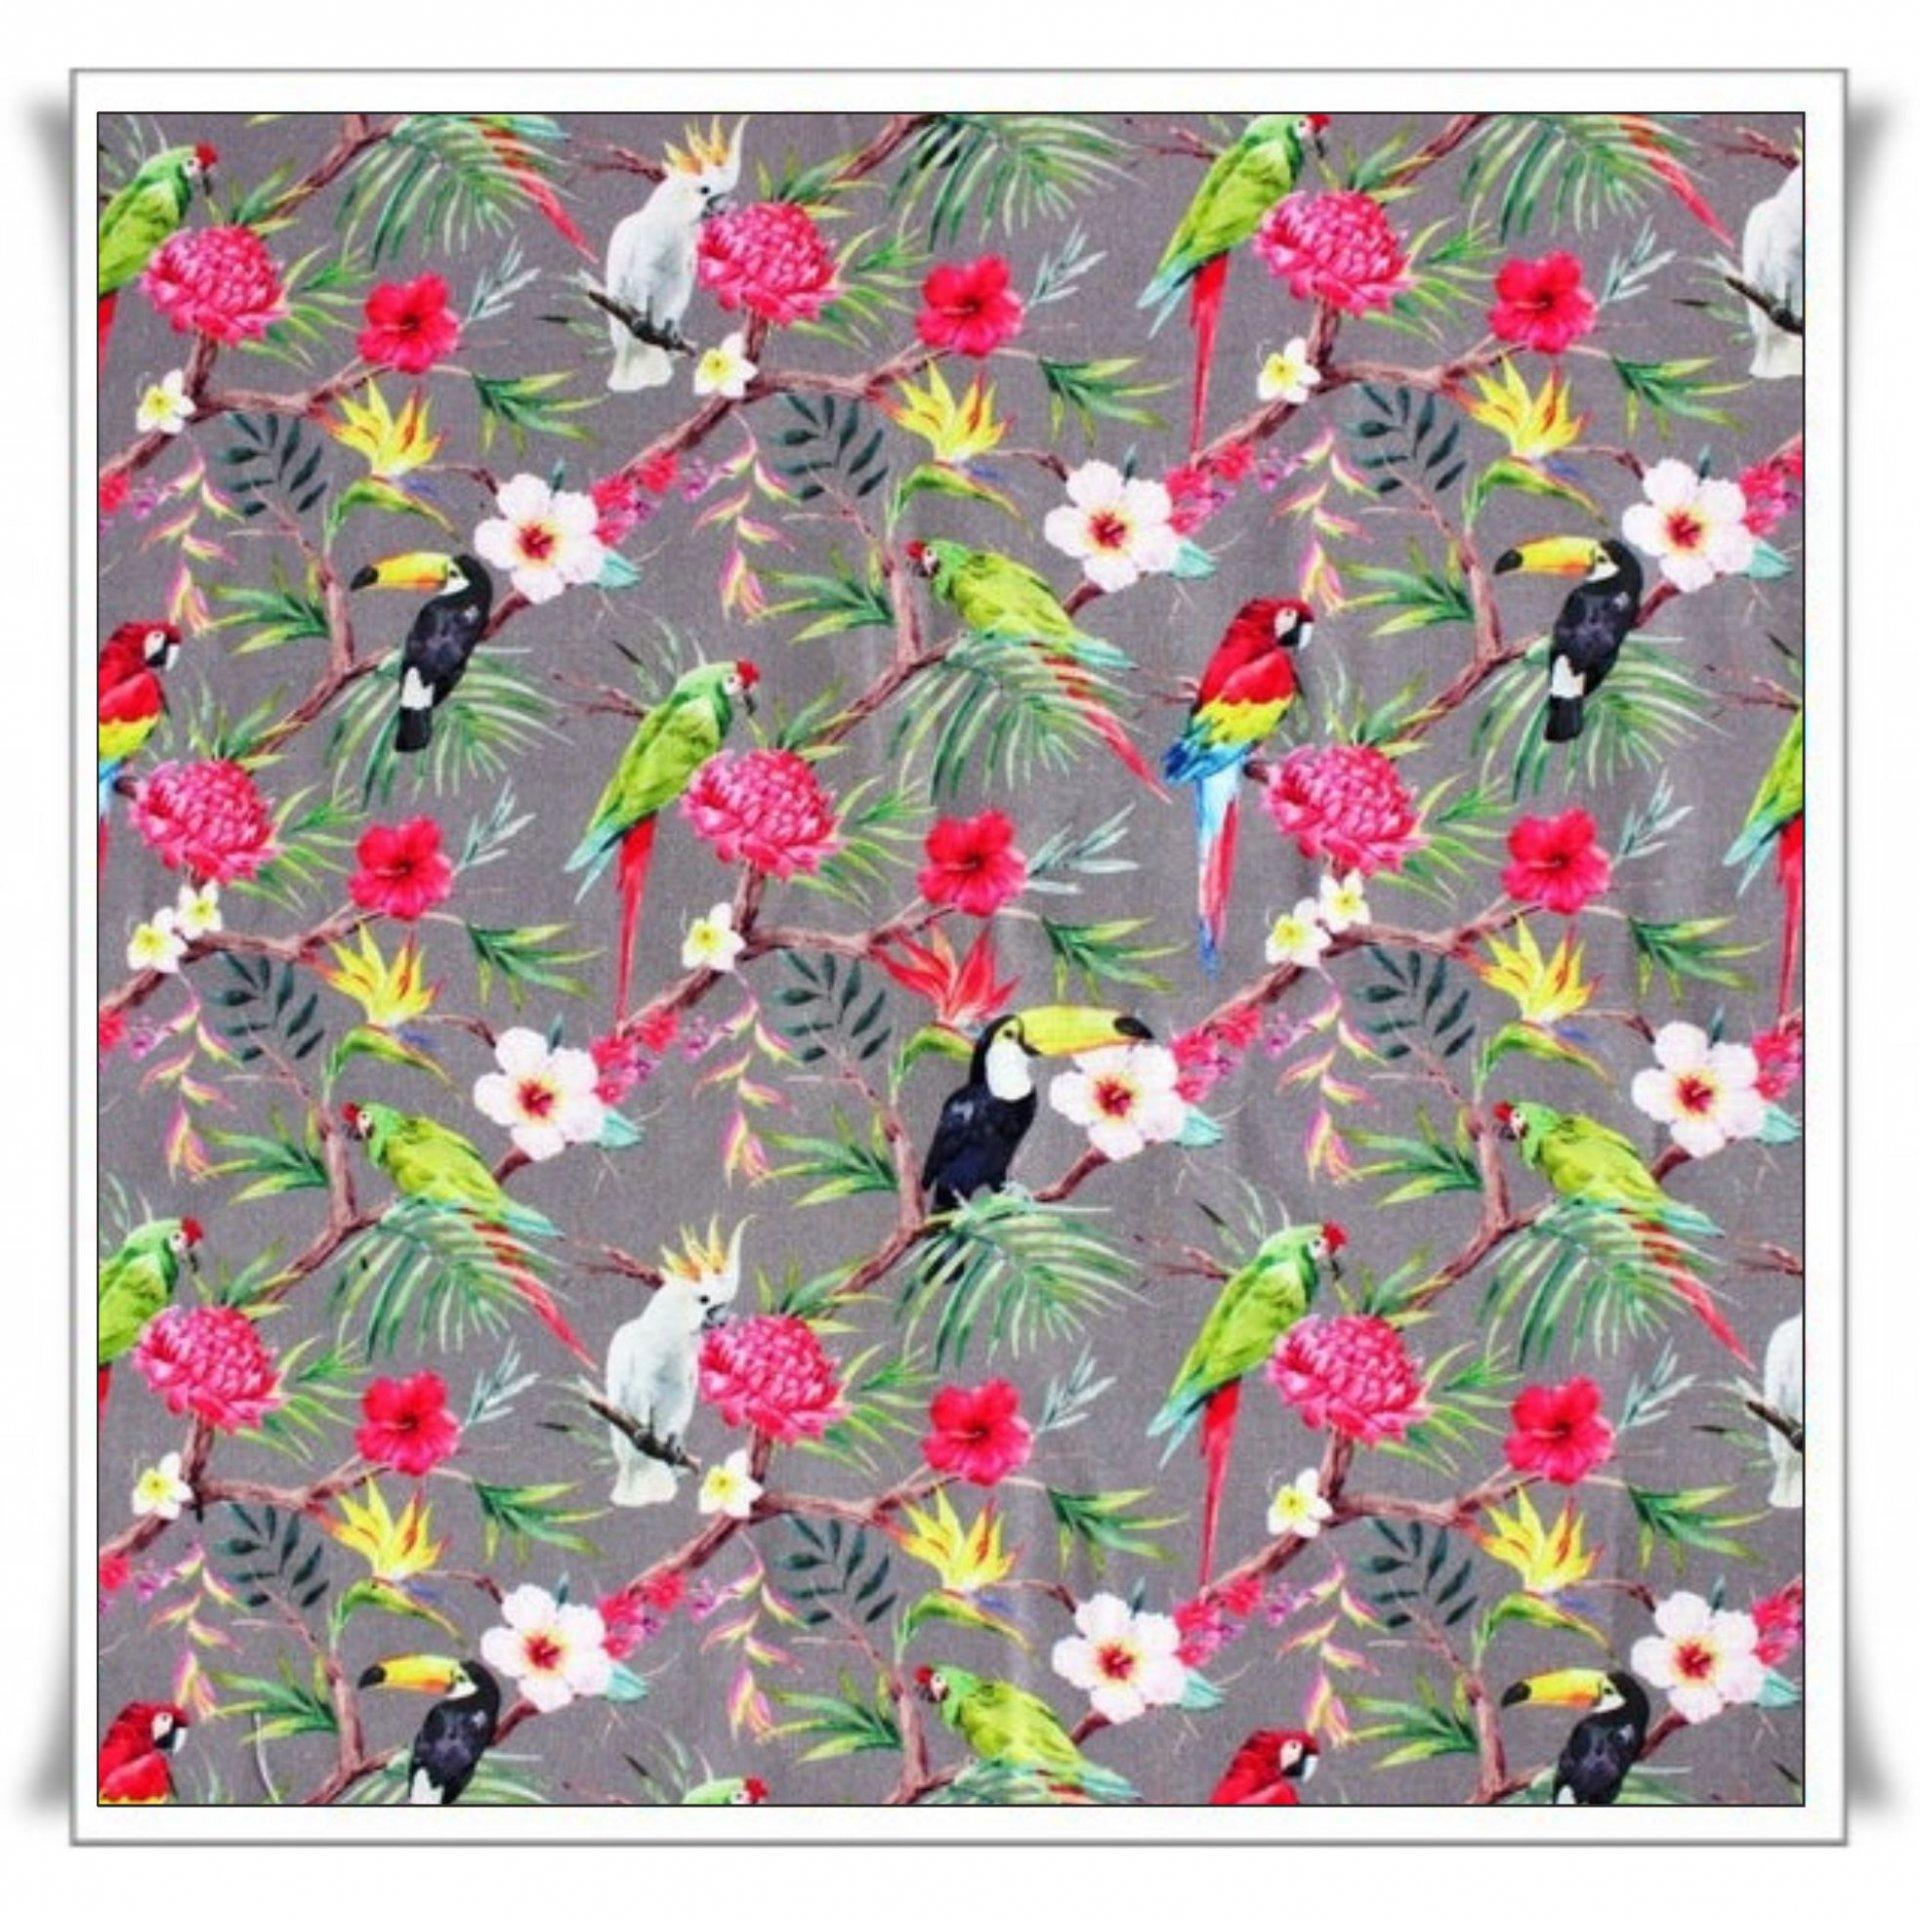 24- TROPICAL BIRDS.jpg